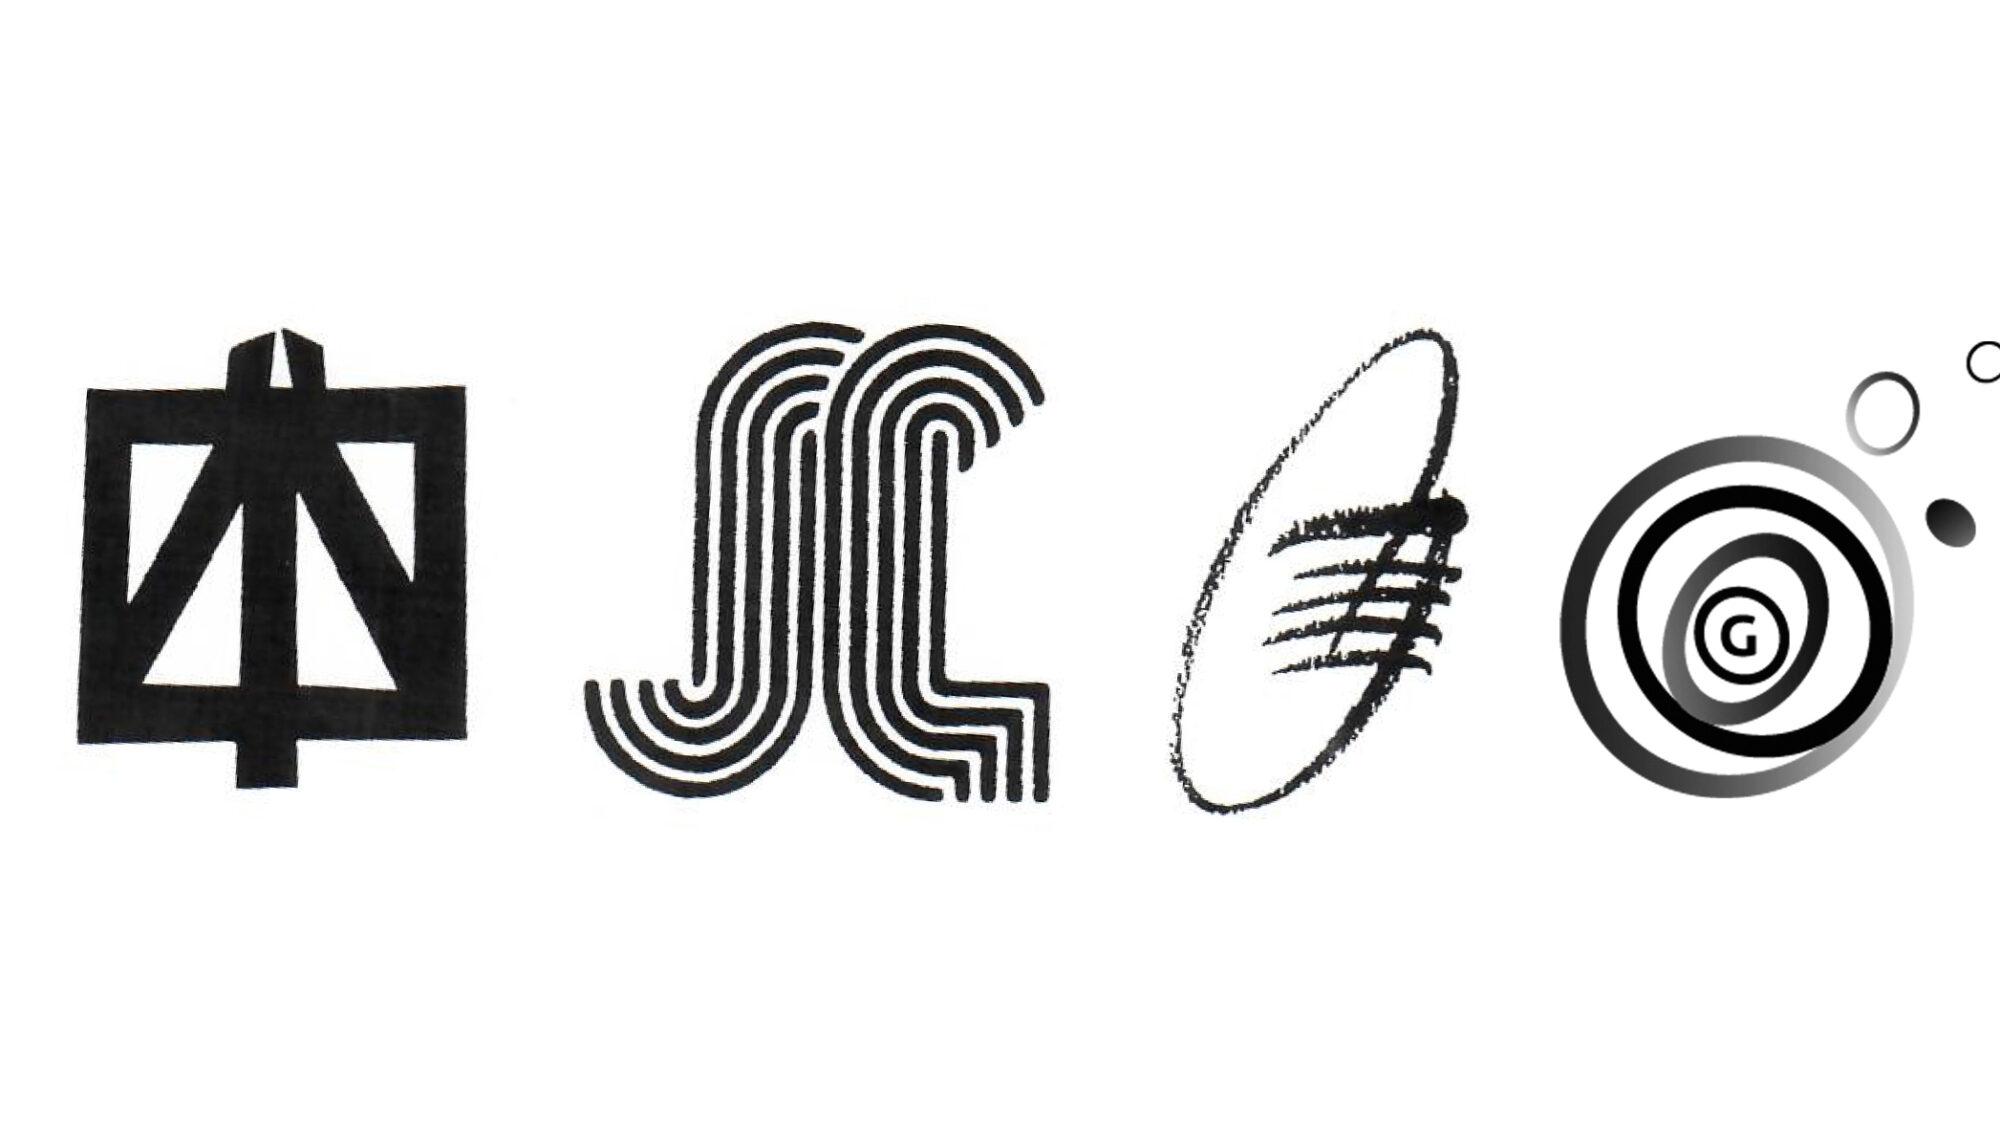 Gaudeamus logos